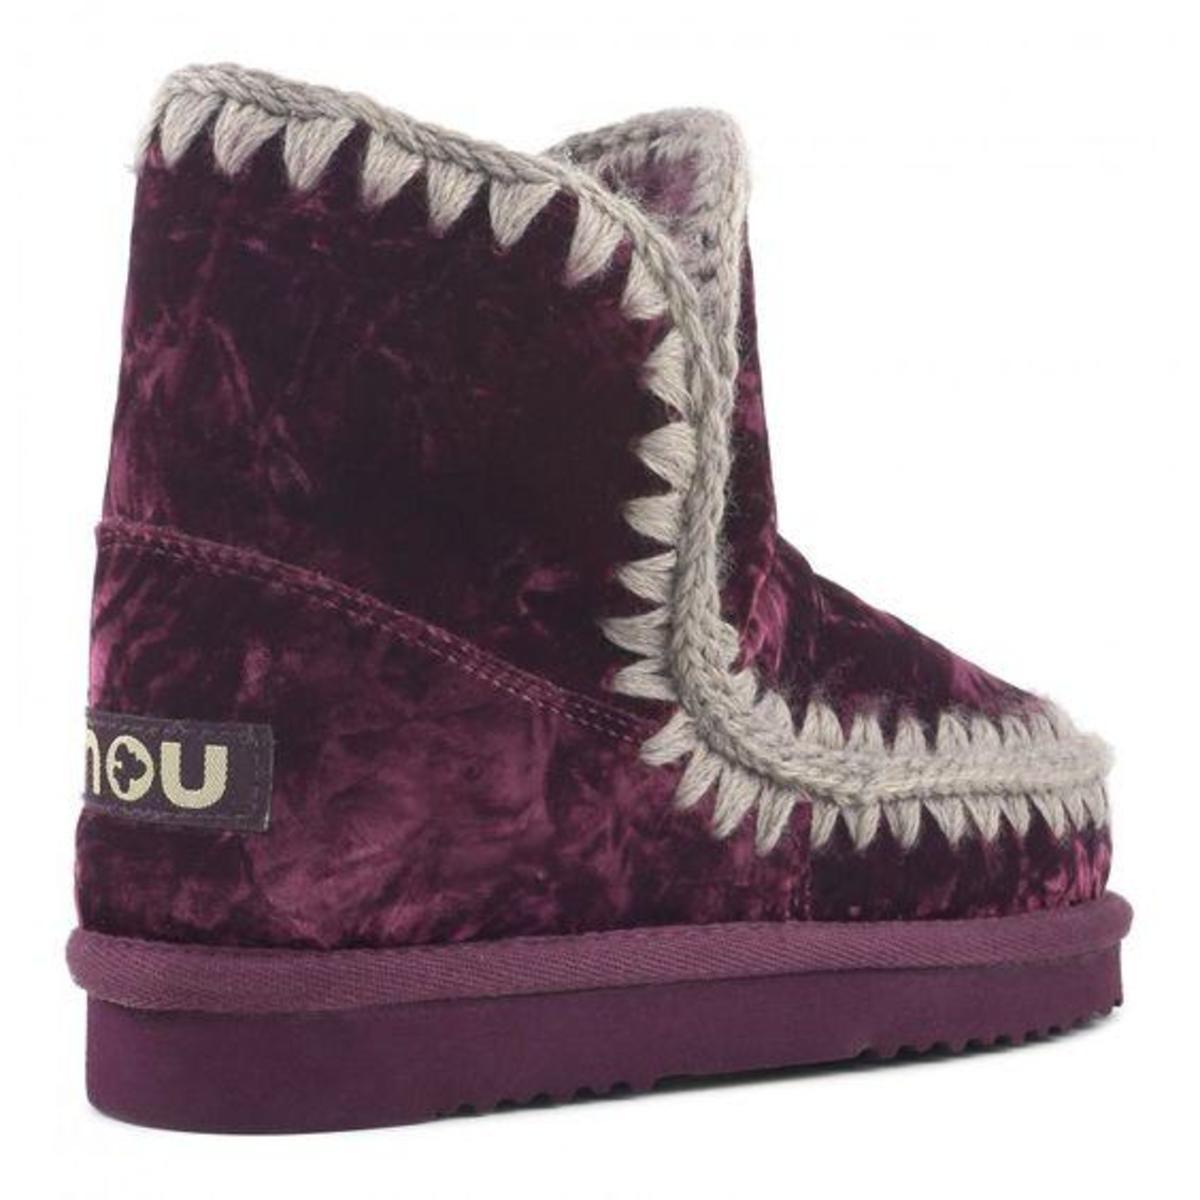 76d78a9e8c7 Mou Eskimo 18cm Boot - Ruby